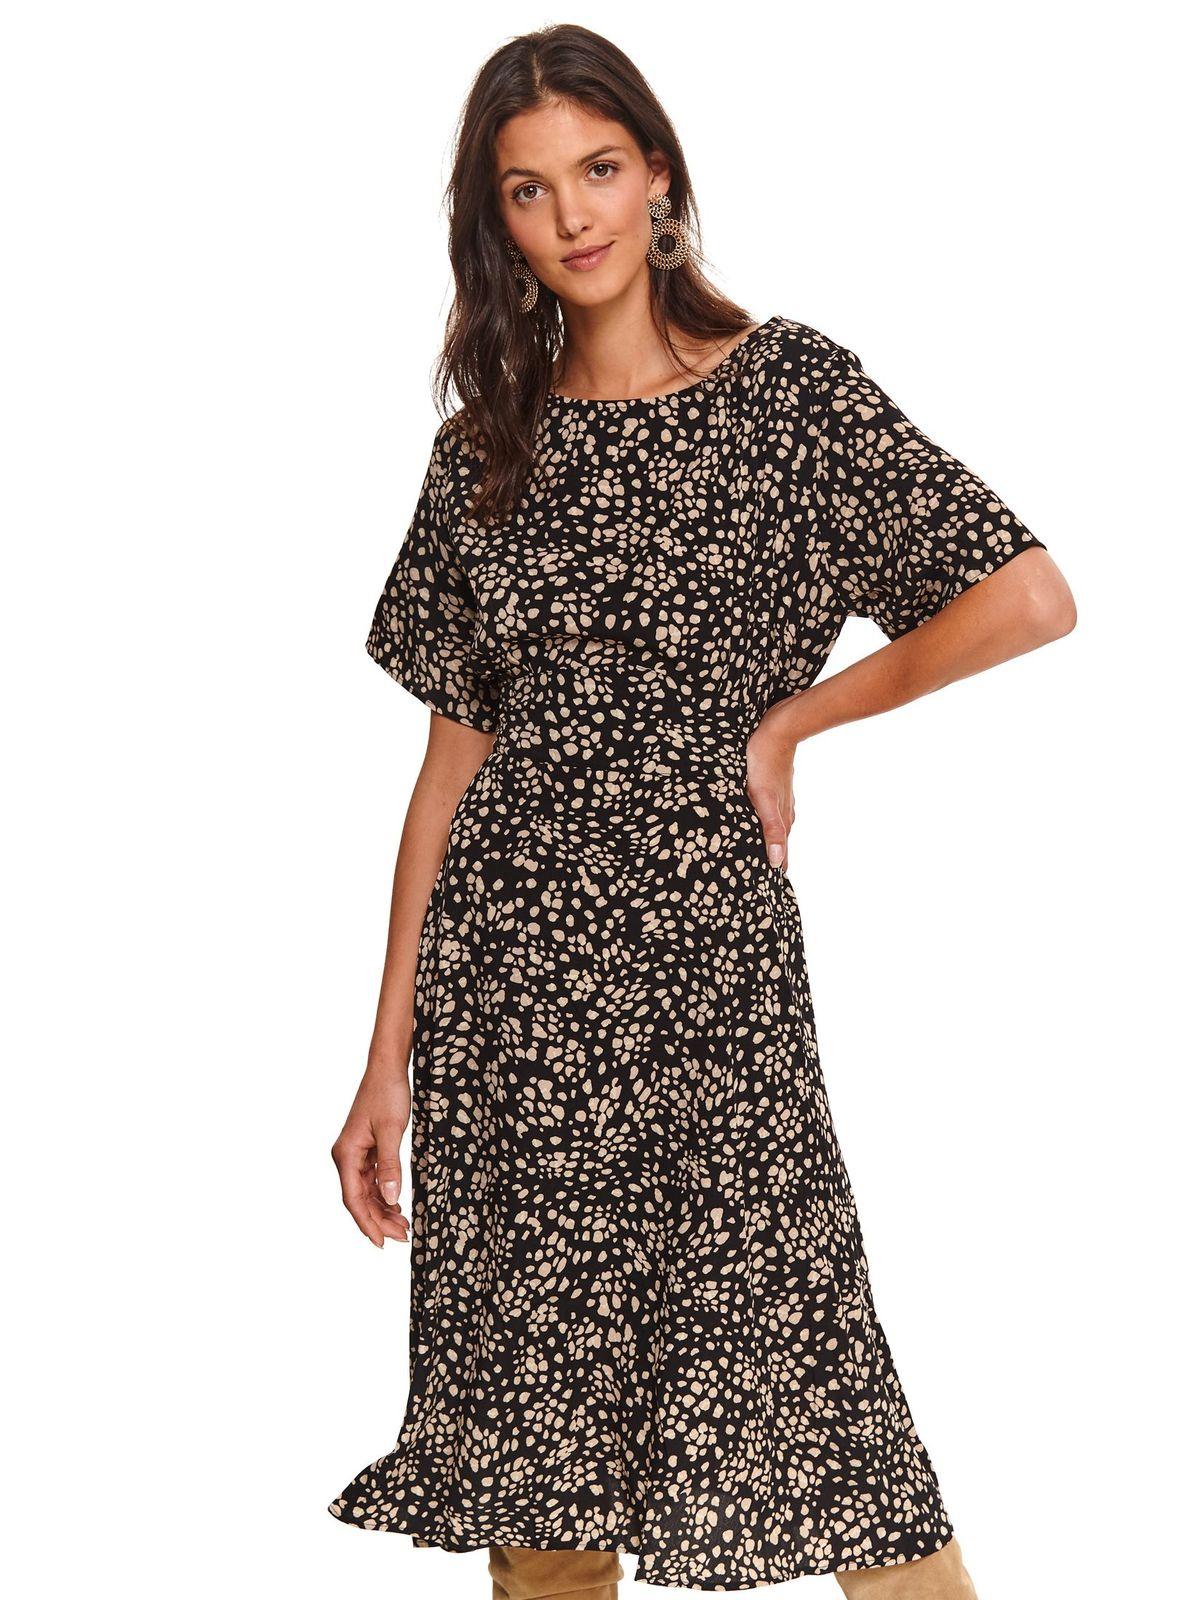 Black dress midi flaring cut thin fabric